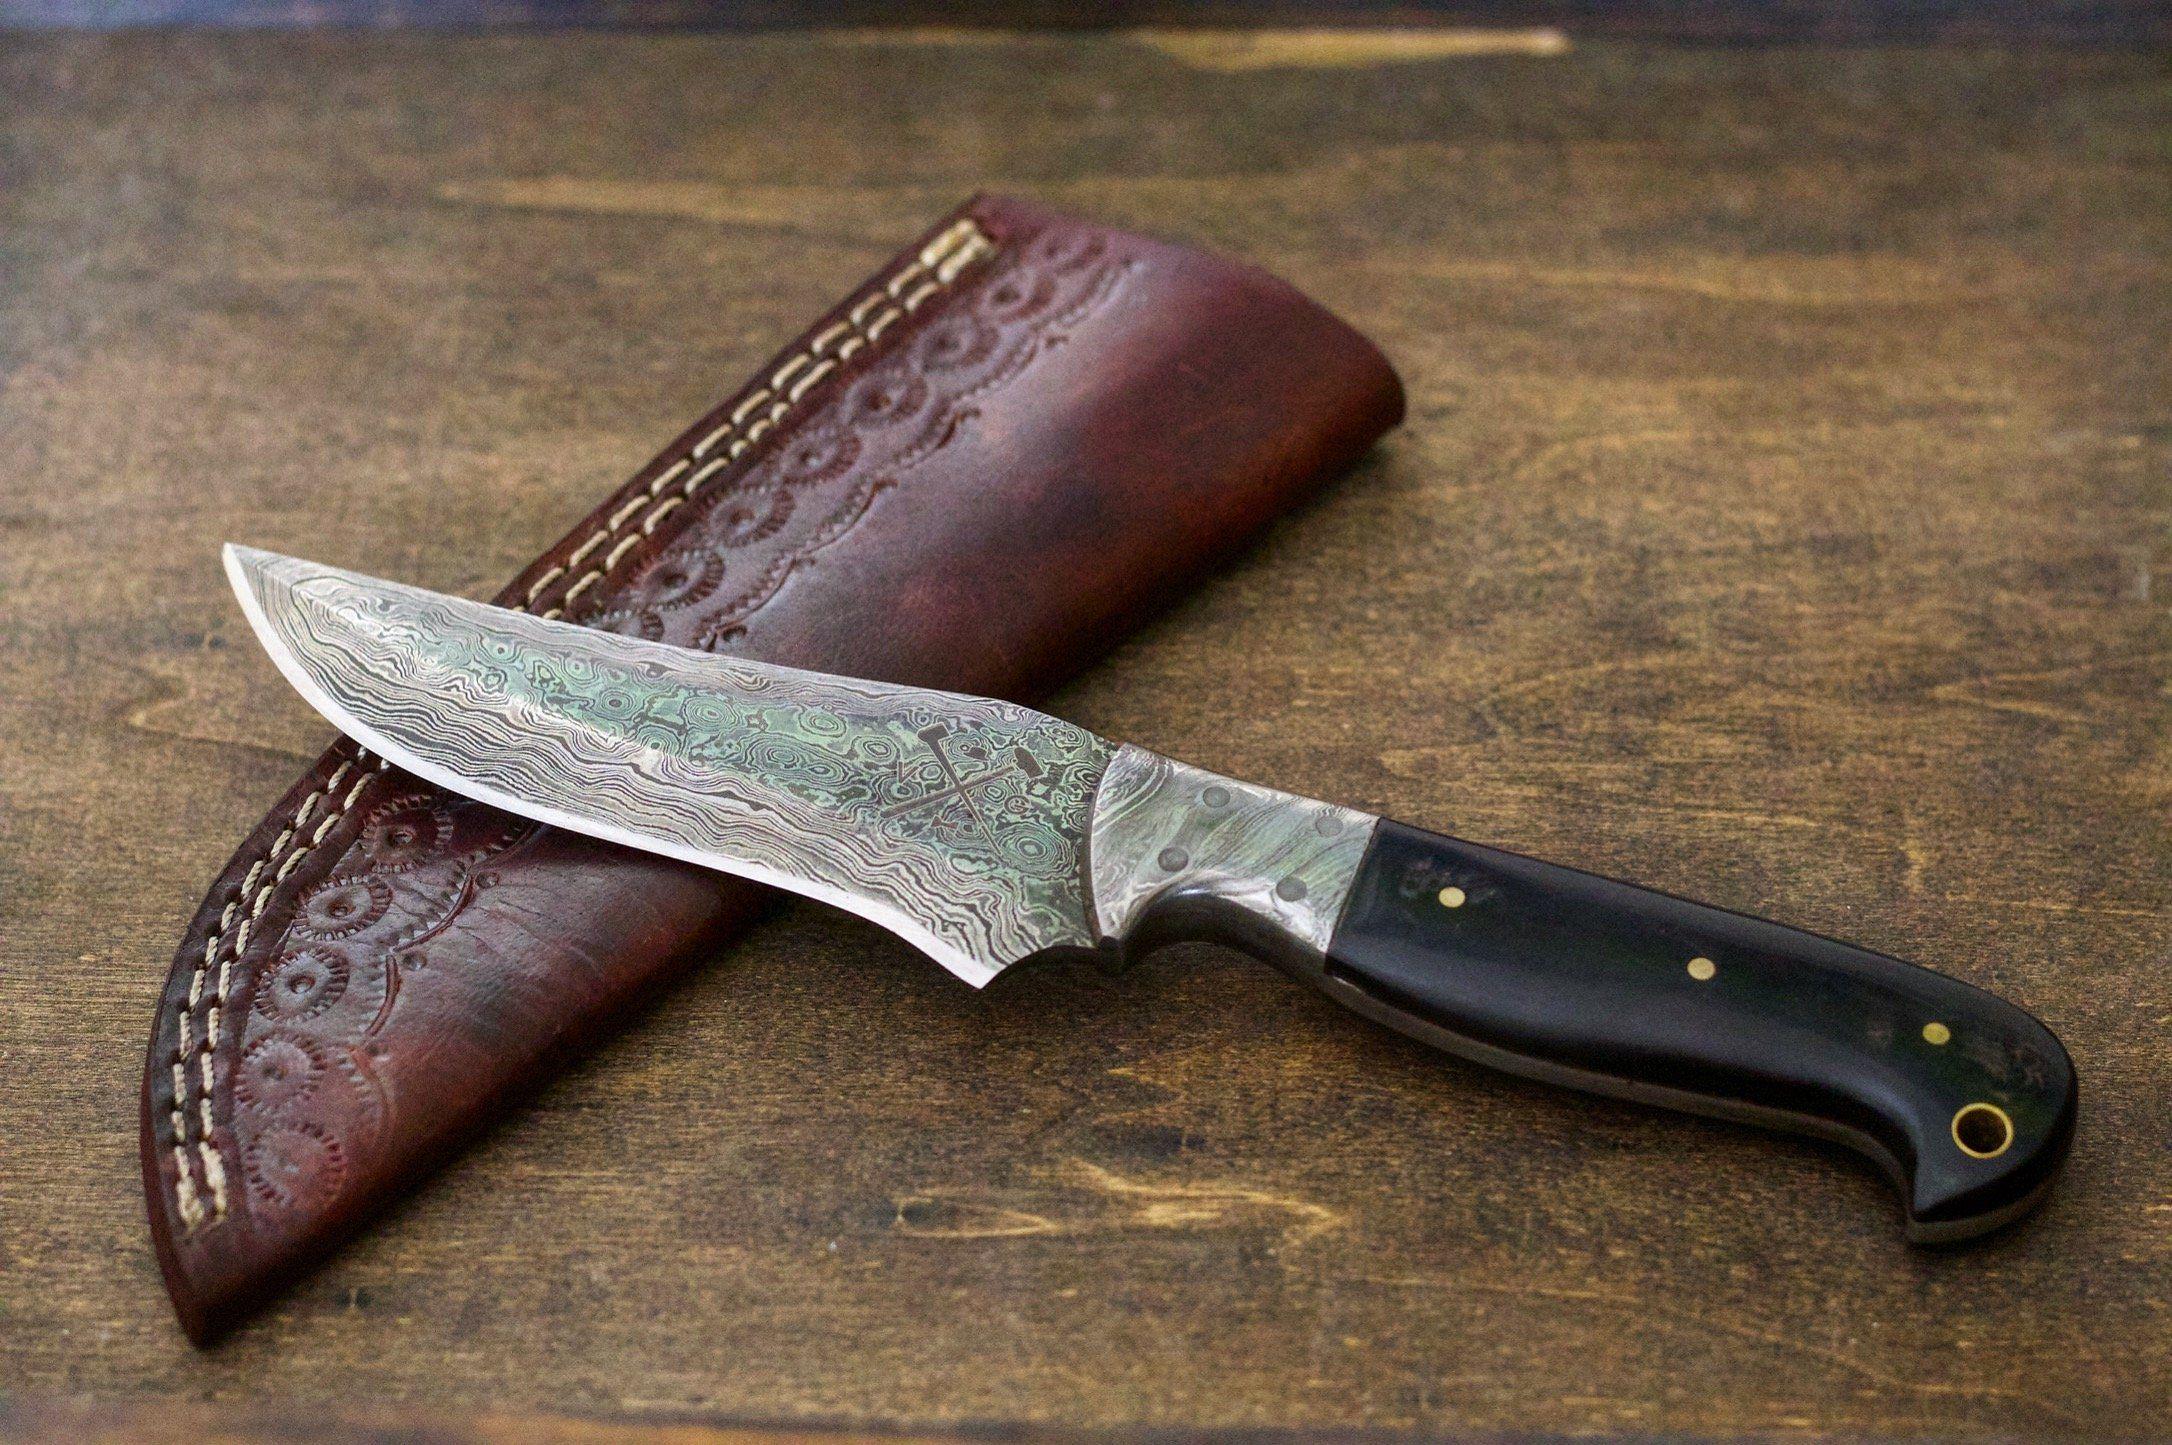 Damascus Steel Hunting Knife Buffalo Horn Handle Model Vg11 Hunting Knife Knife Damascus Steel